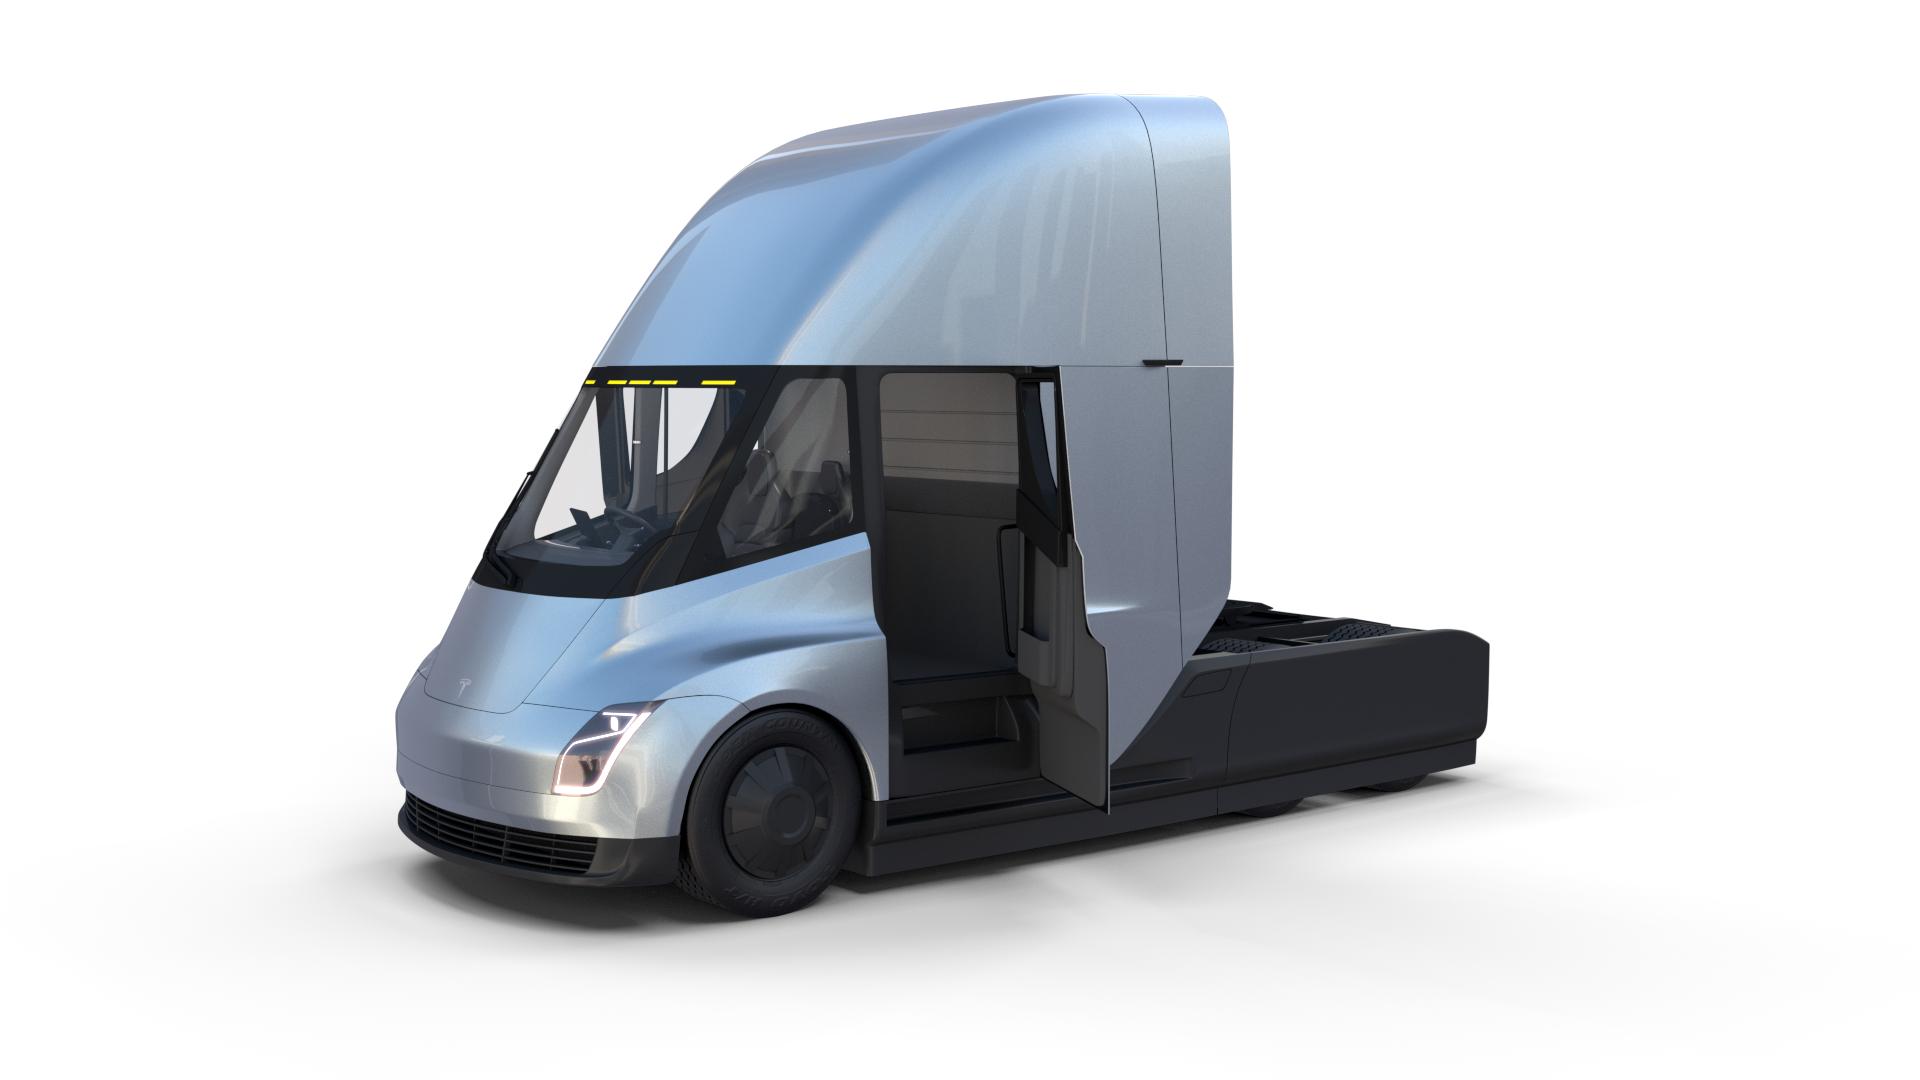 Tesla Truck With Interior Silver Tesla Trucks Tesla Semi Truck